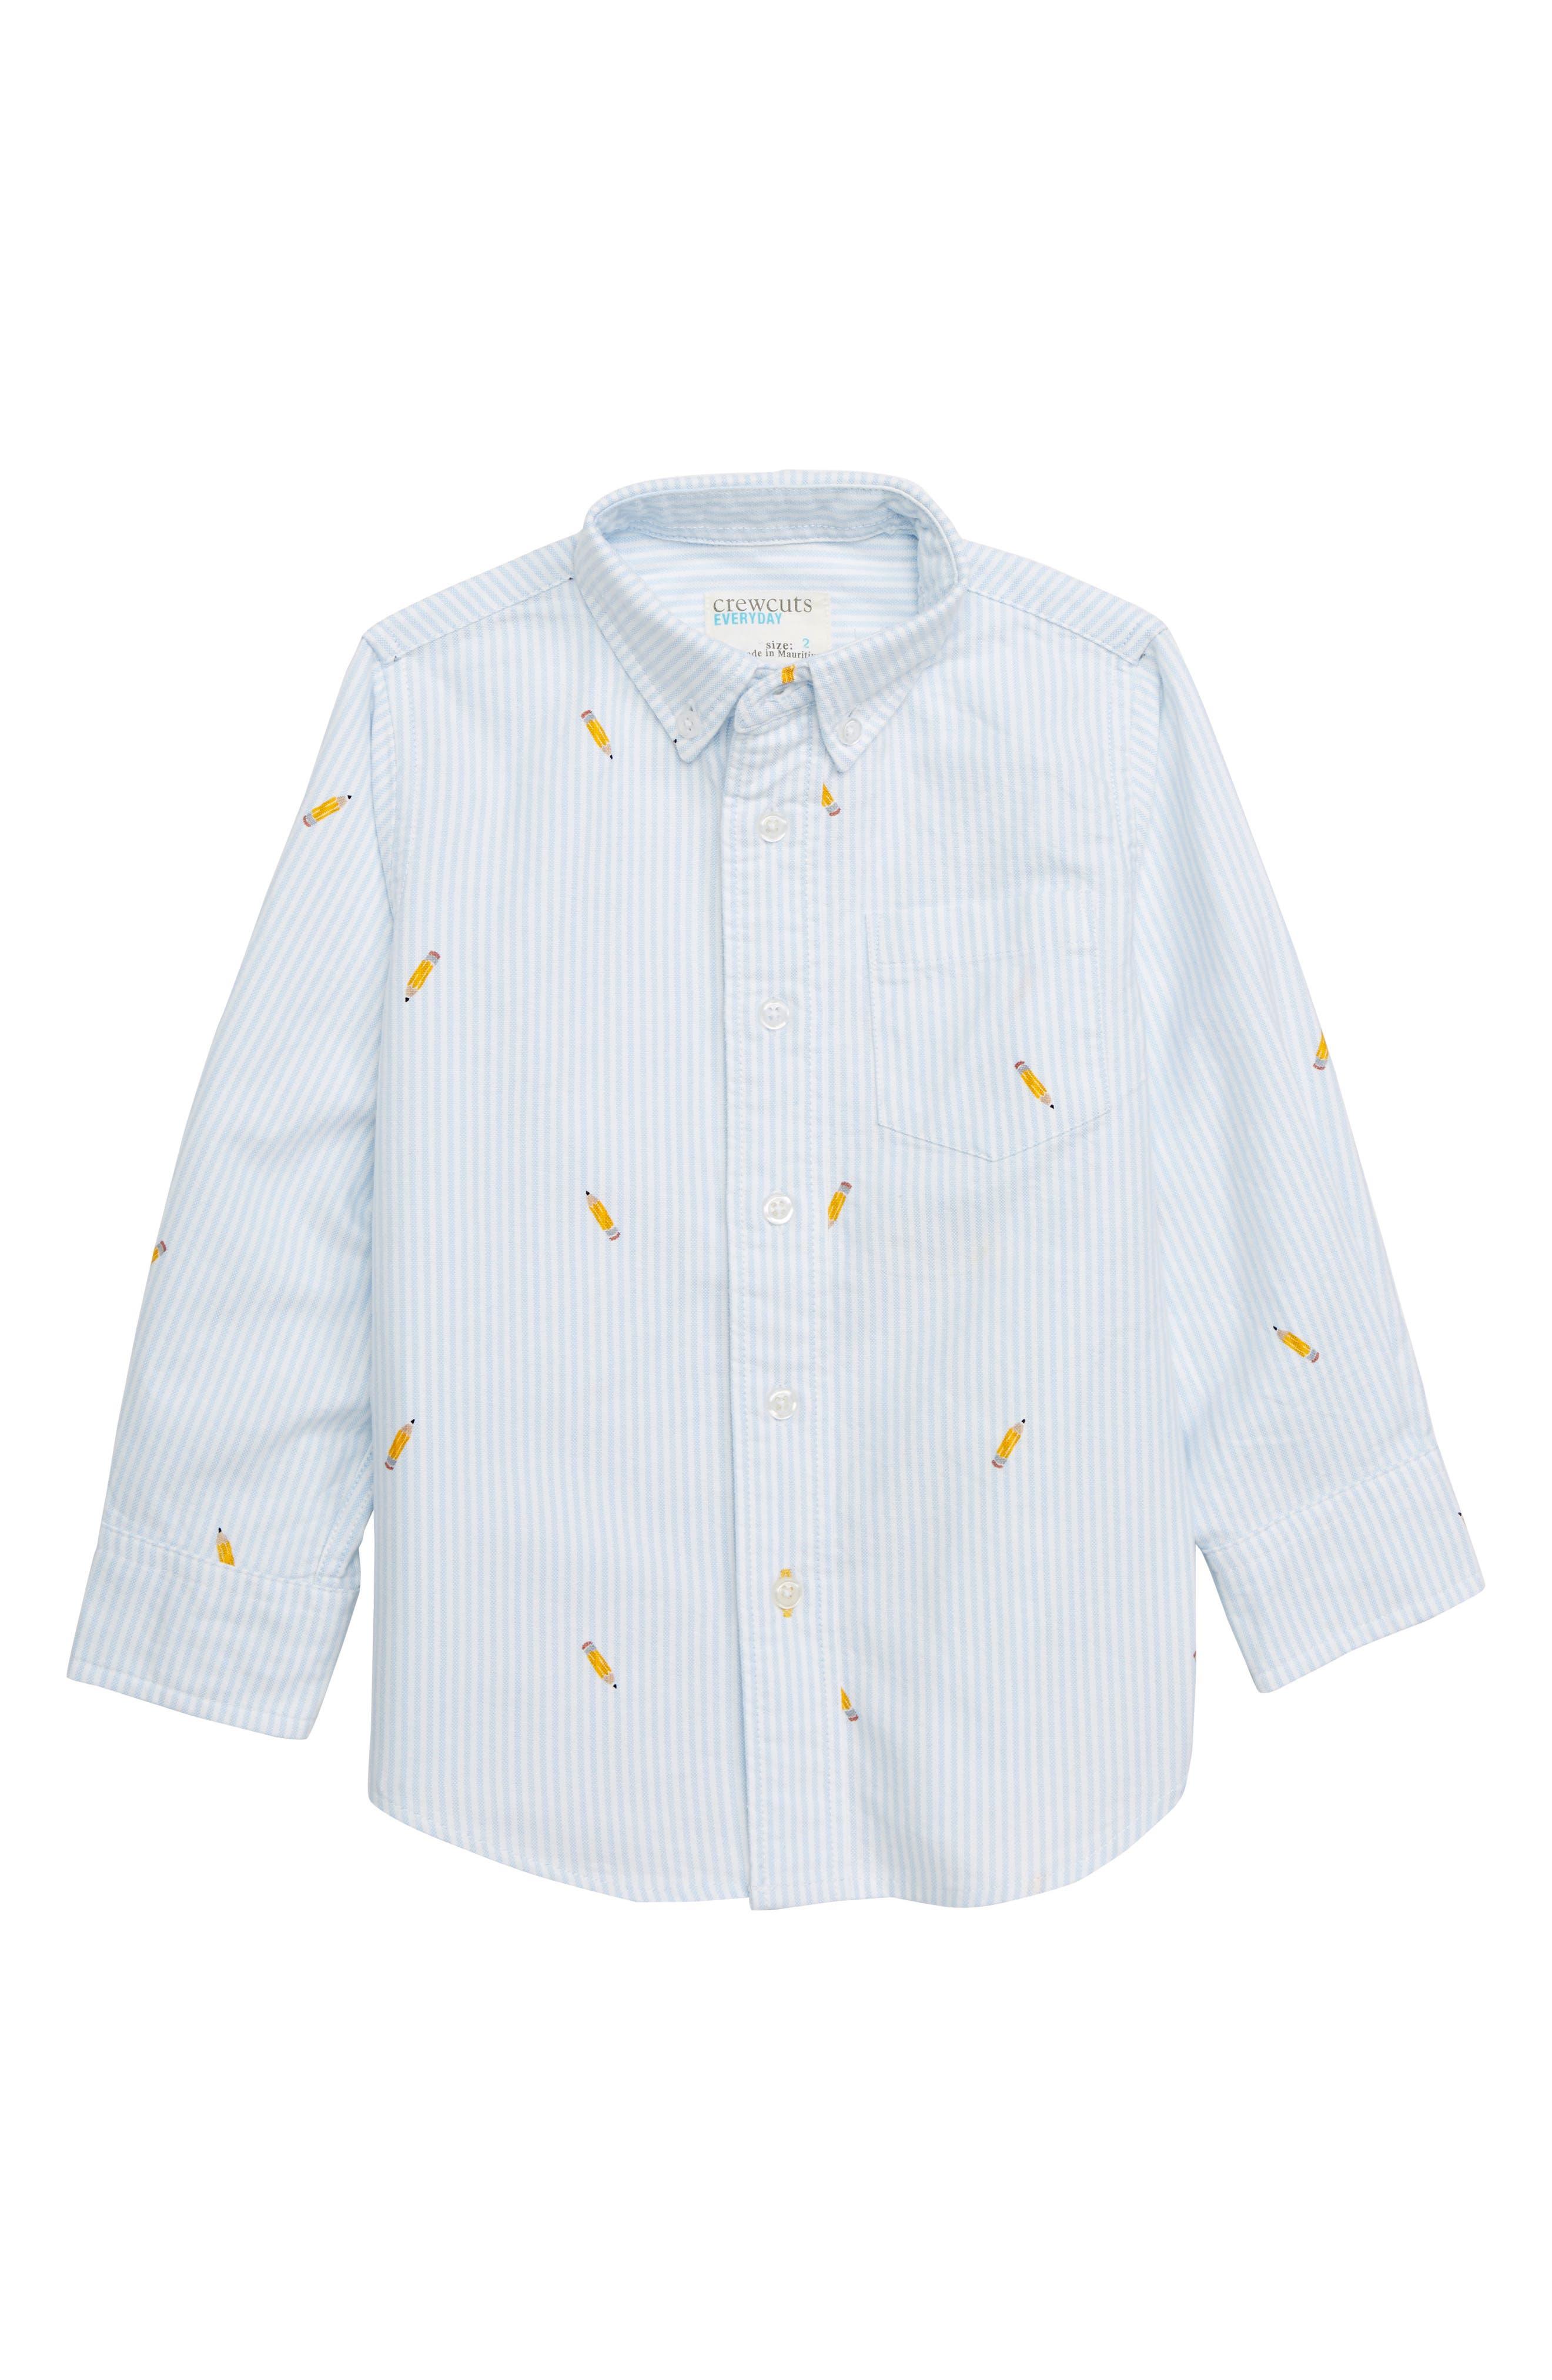 Critter Oxford Shirt,                         Main,                         color, BLUE MULTI